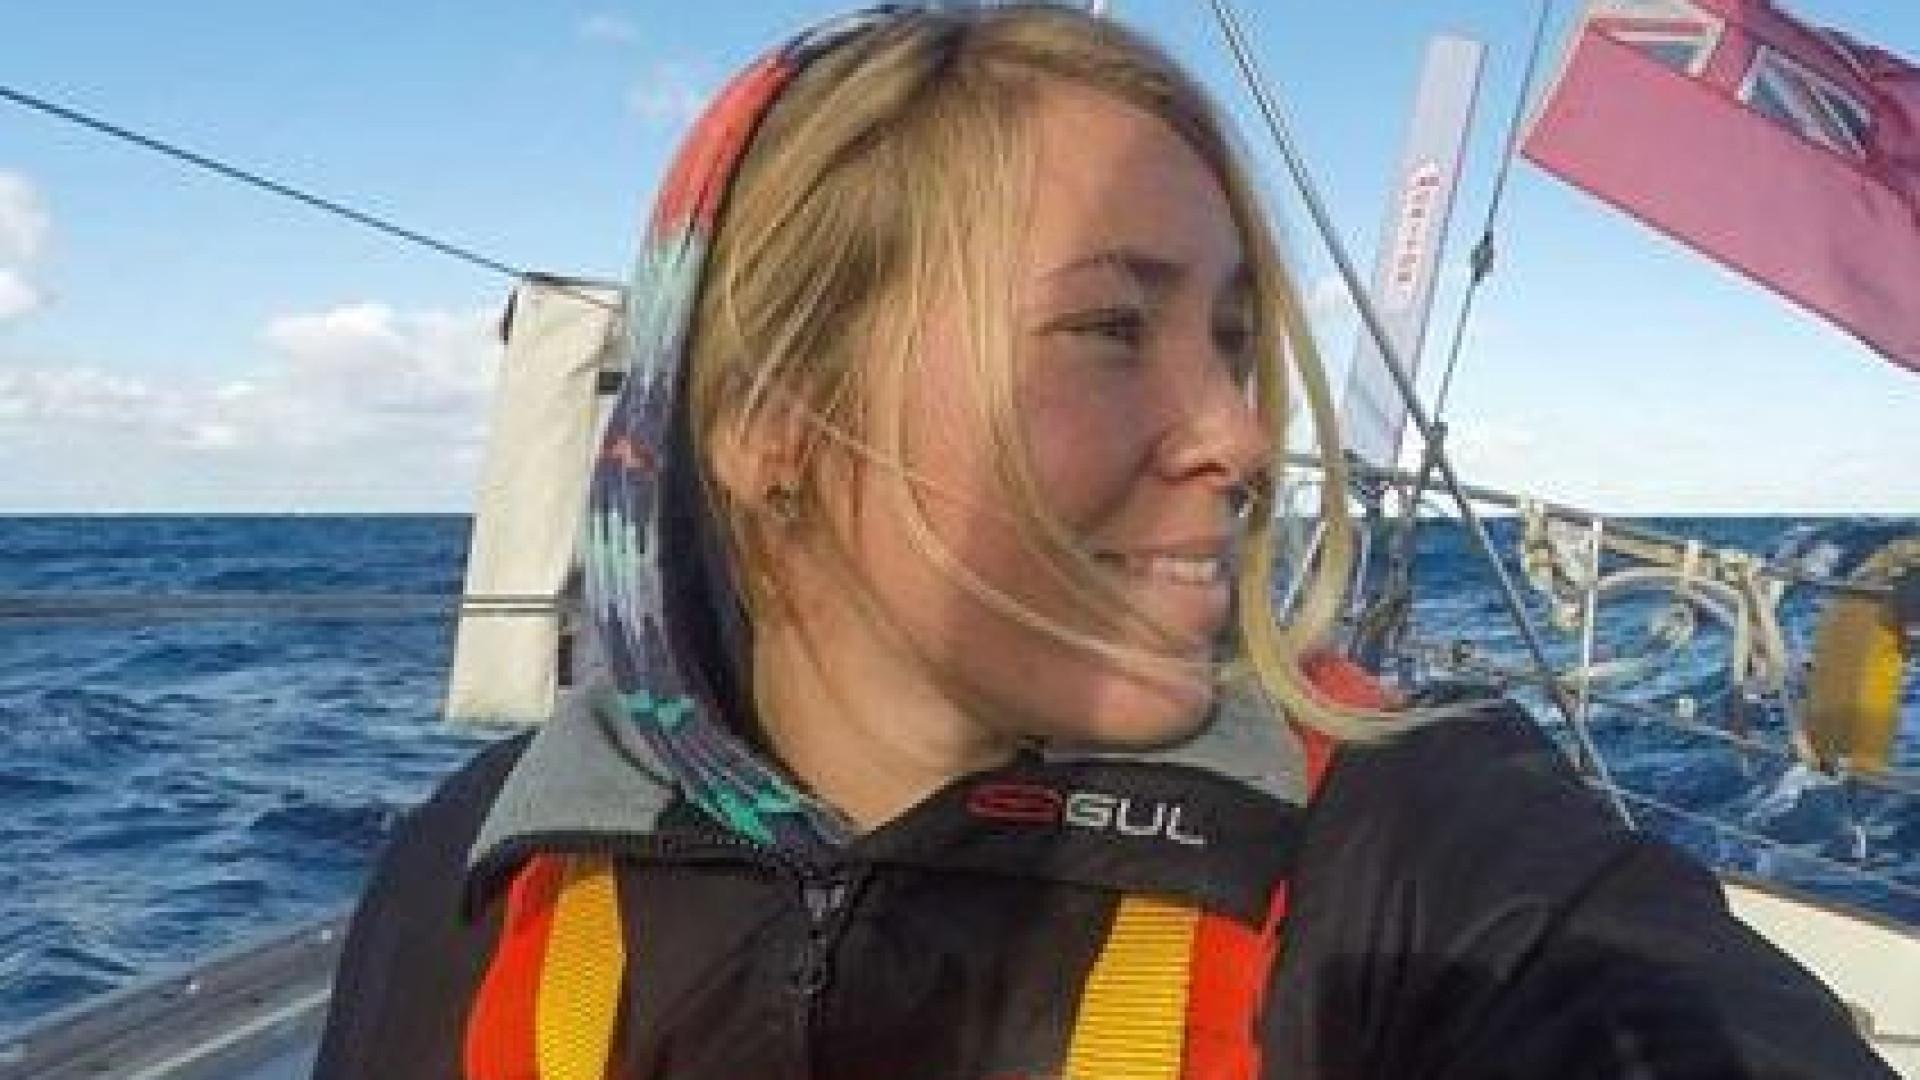 Velejadora britânica resgatada após perder mastro em corrida